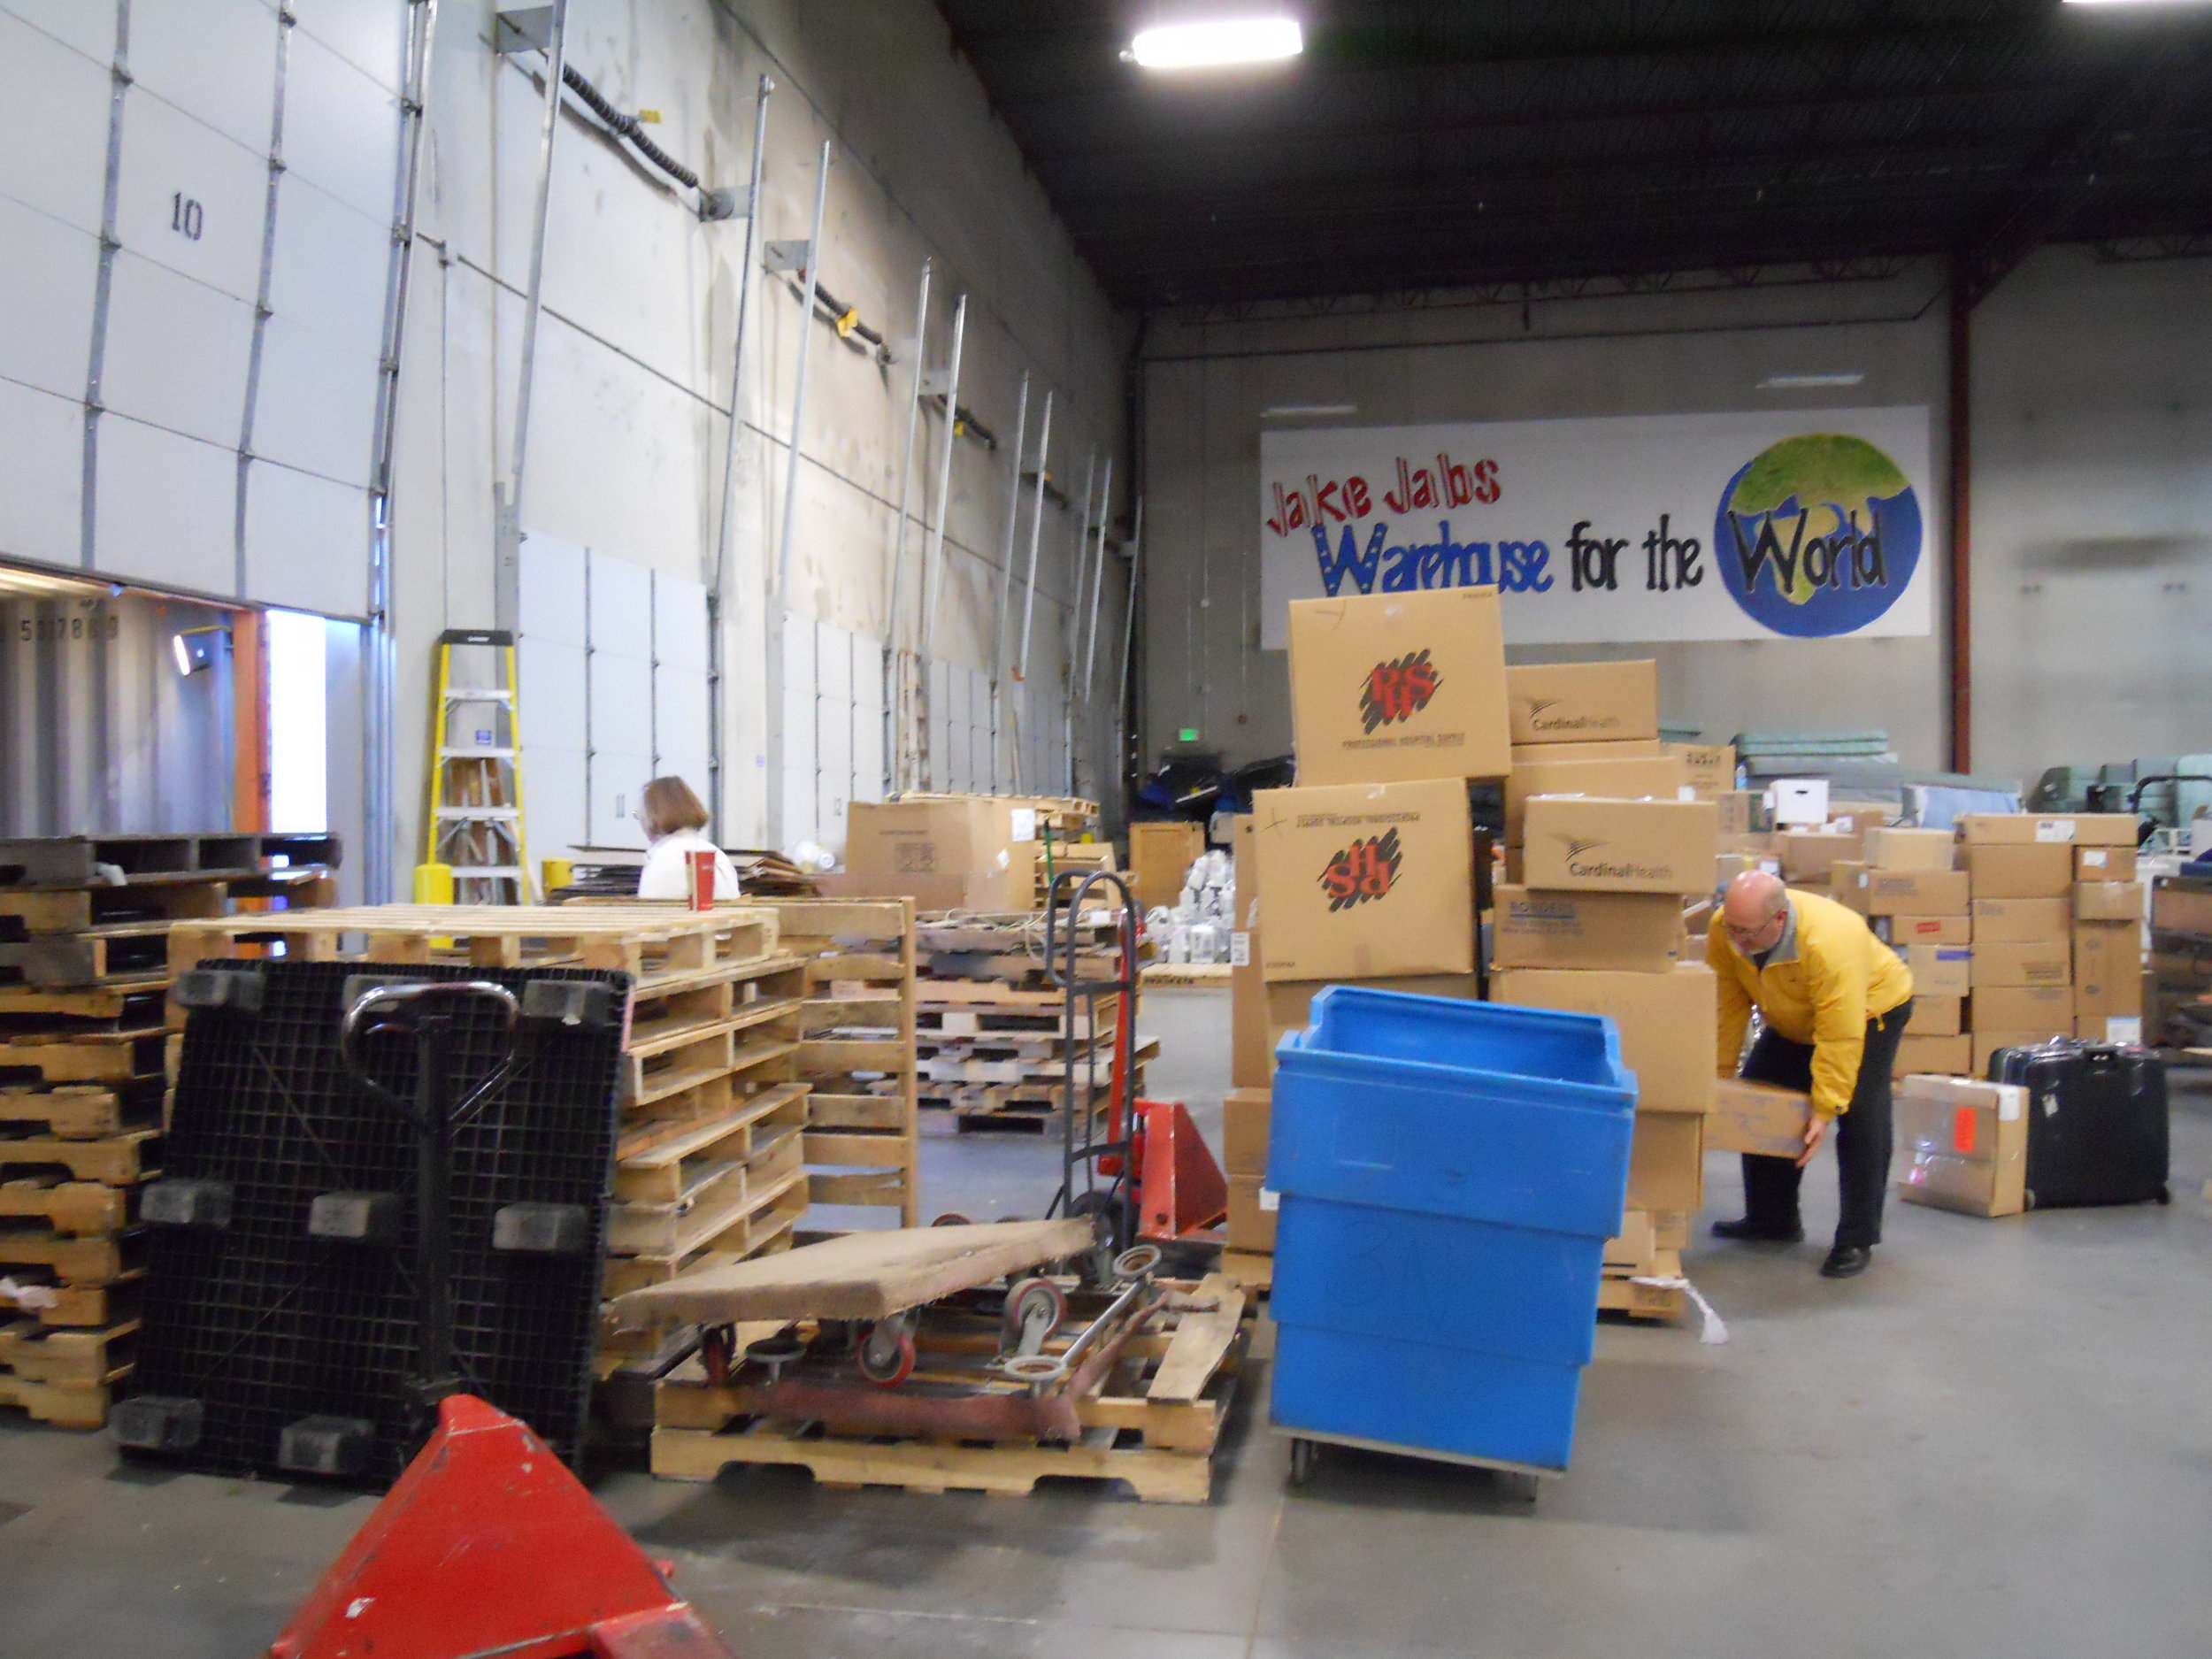 Gary De Kler loading boxes at Project C.U.R.E. warehouse